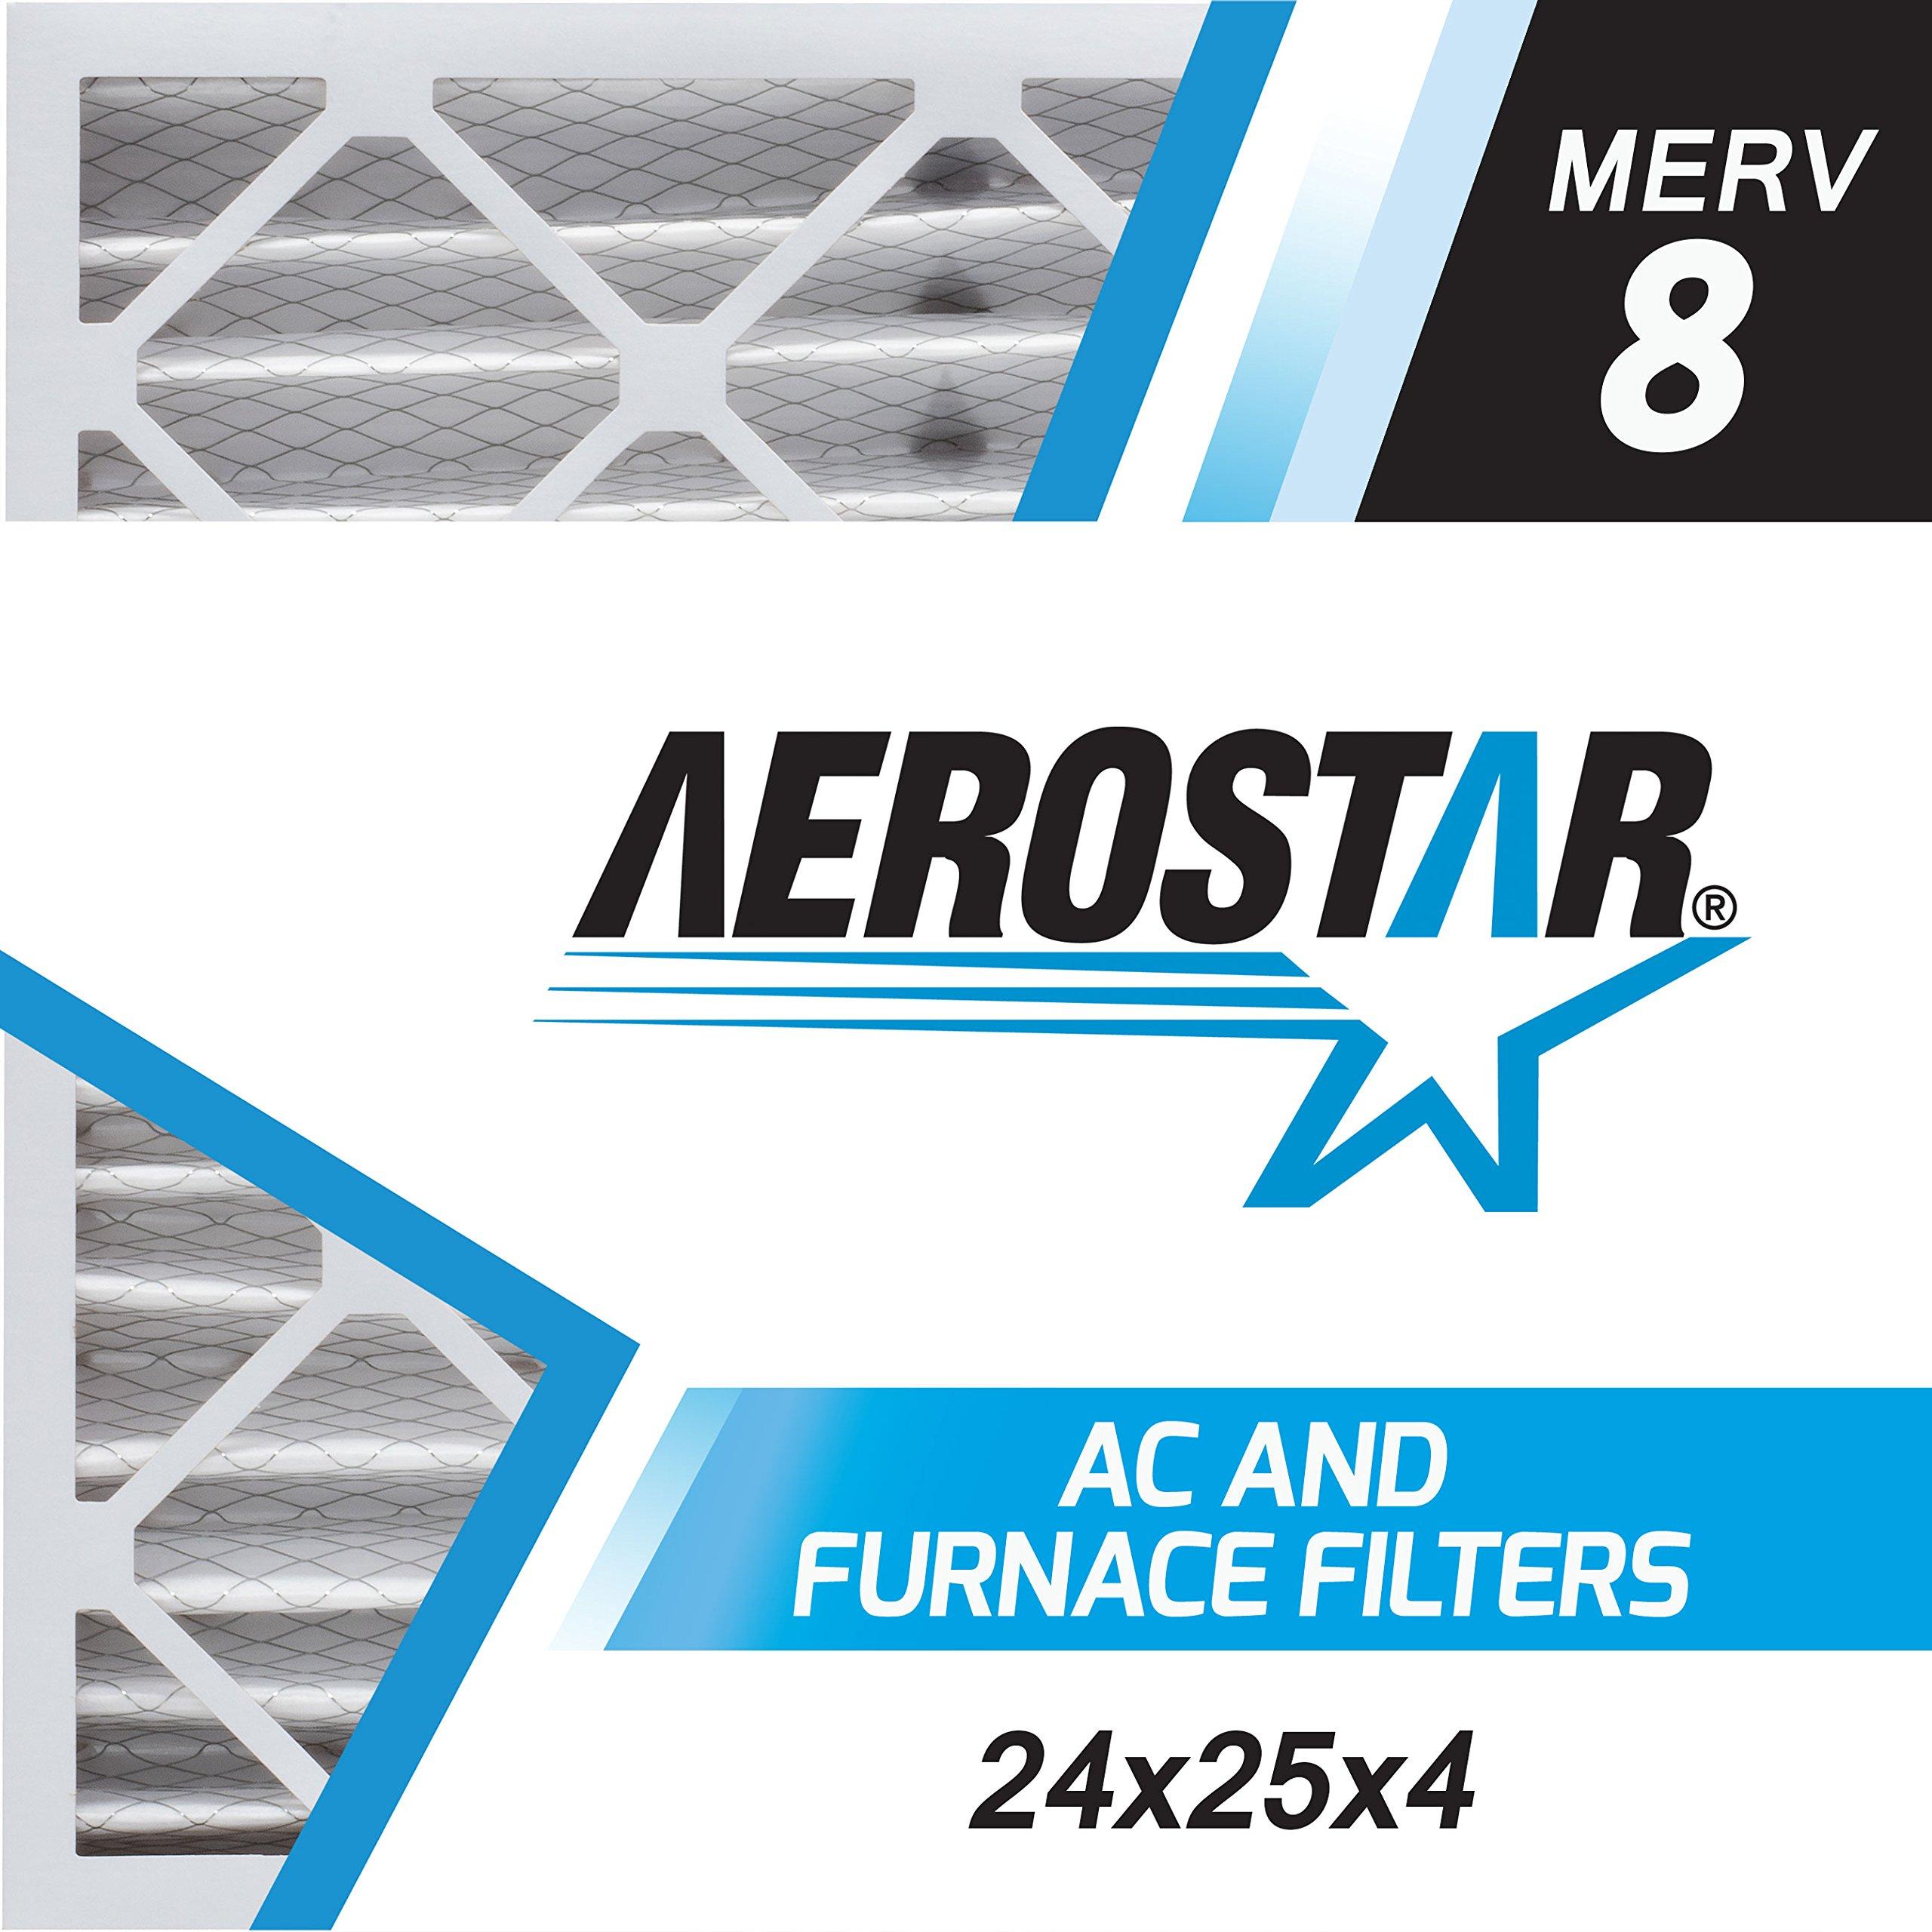 Aerostar 24x25x4 MERV 8, Pleated Air Filter, 24 x 25 x 4, Box of 6, Made in the USA